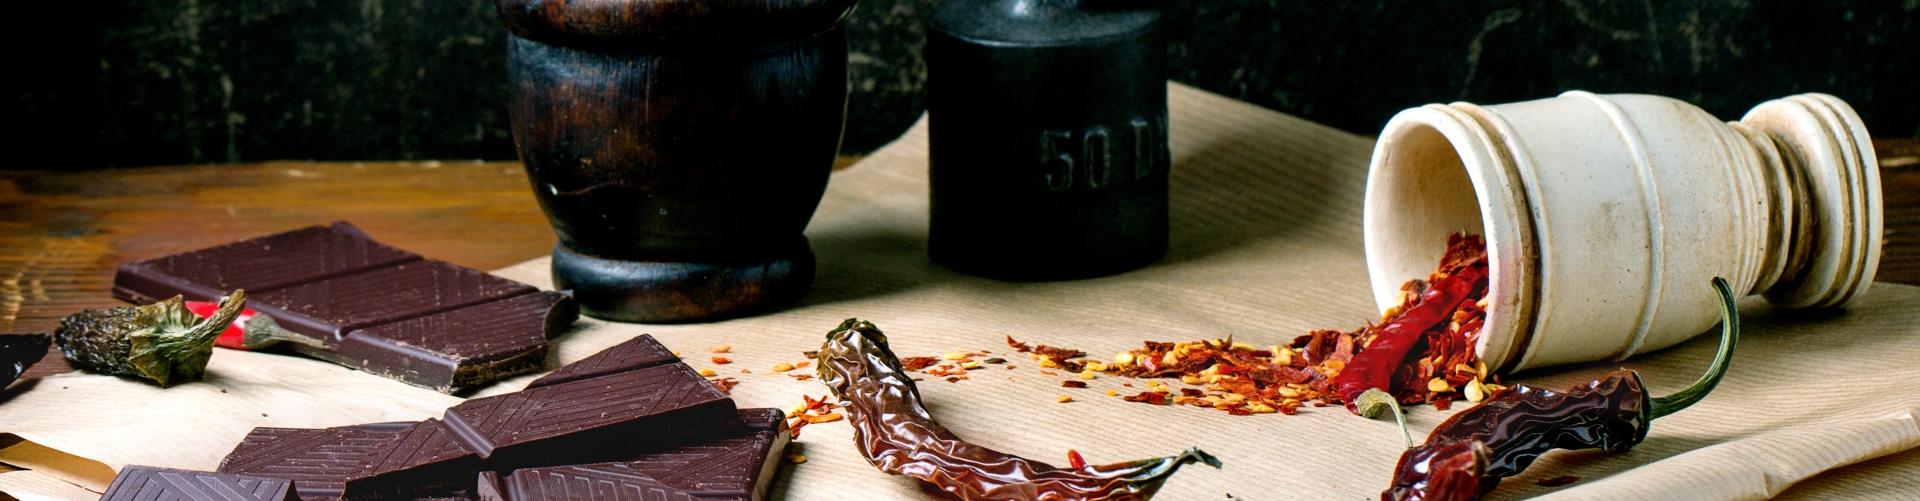 retroscent - geur chocolade